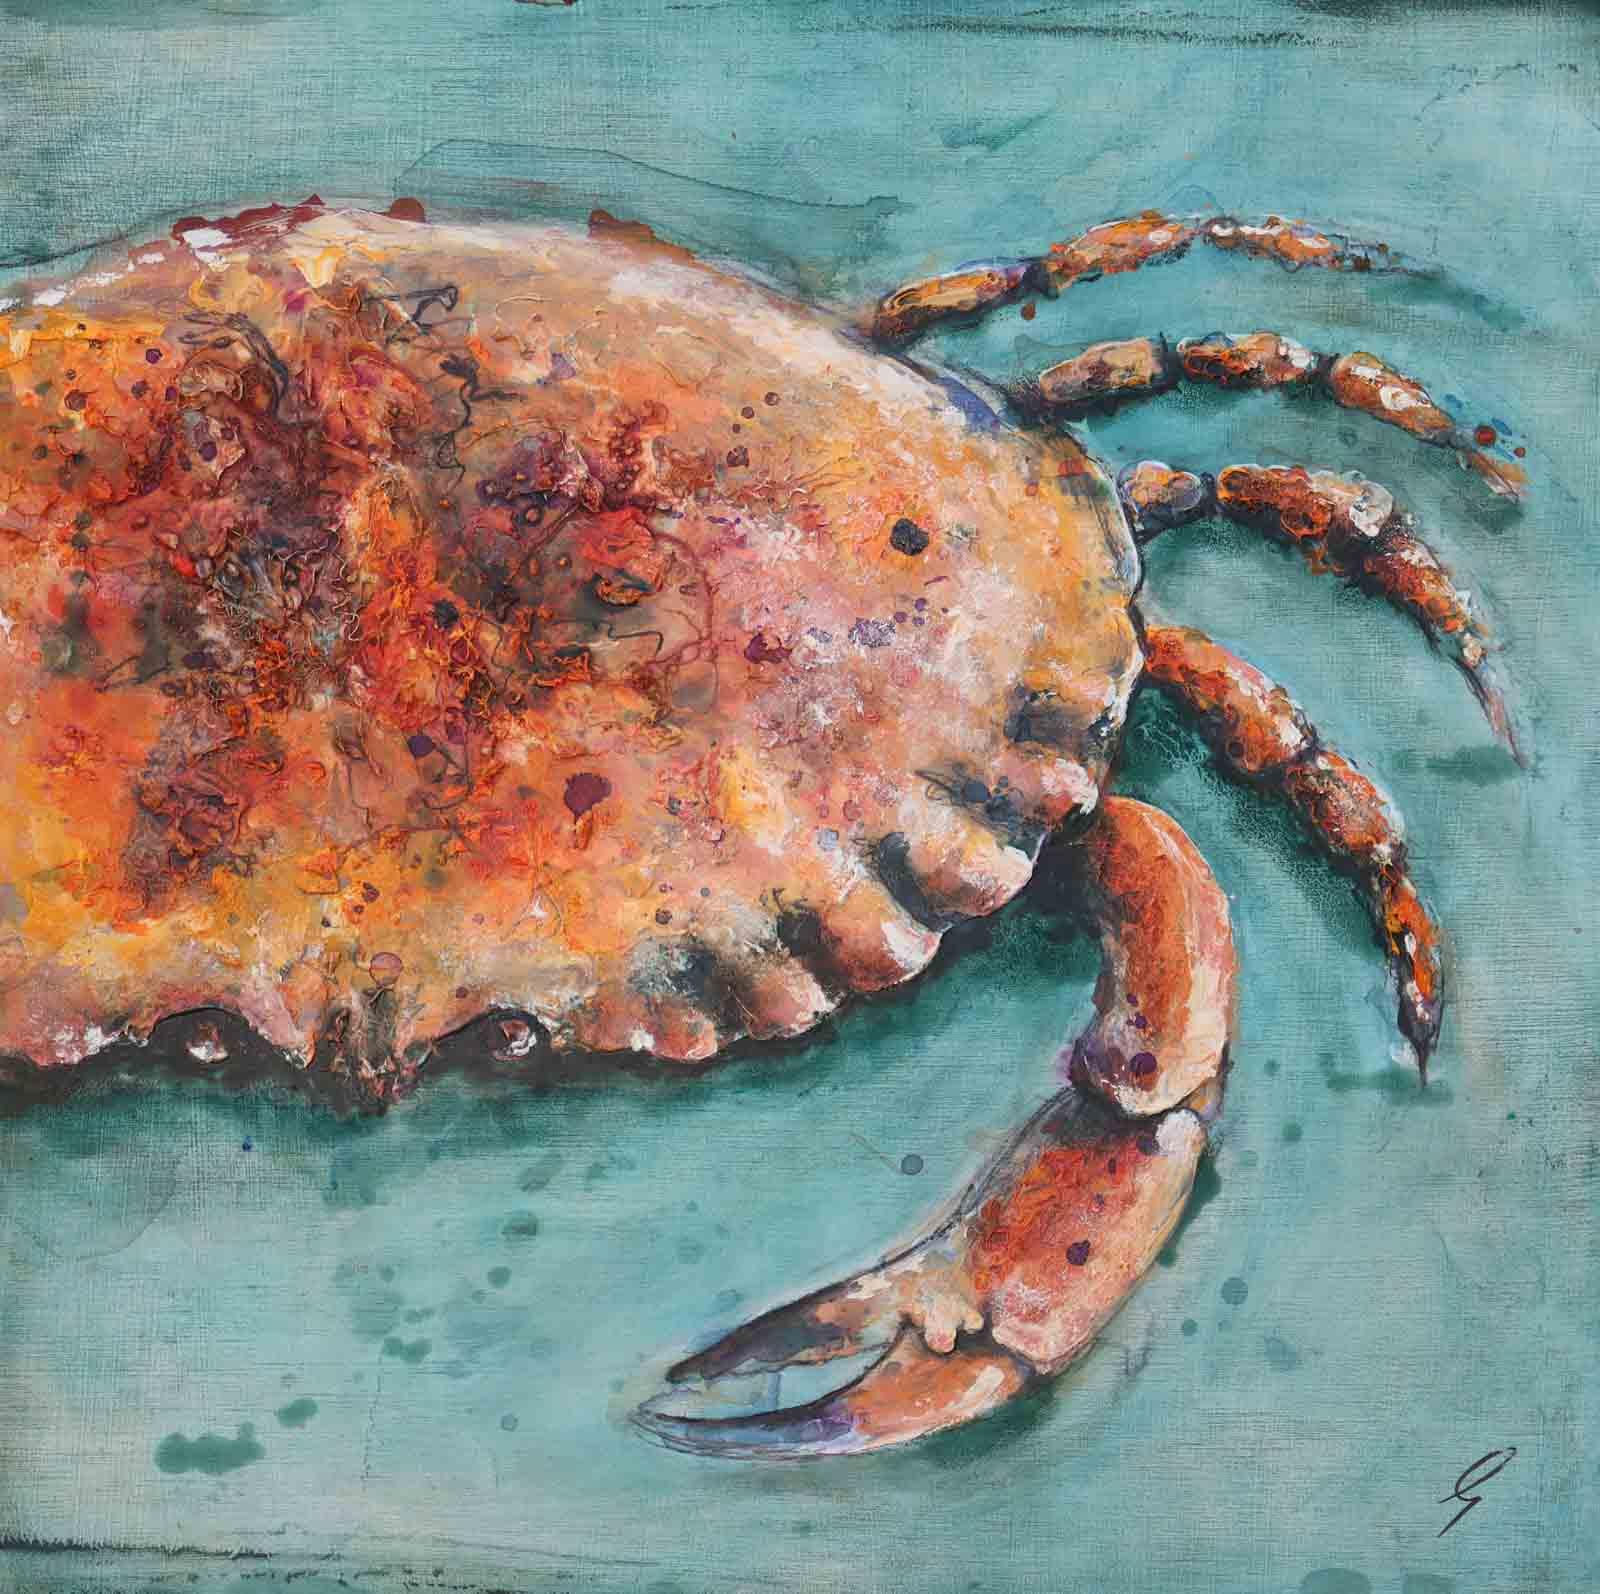 Small Shore Crab